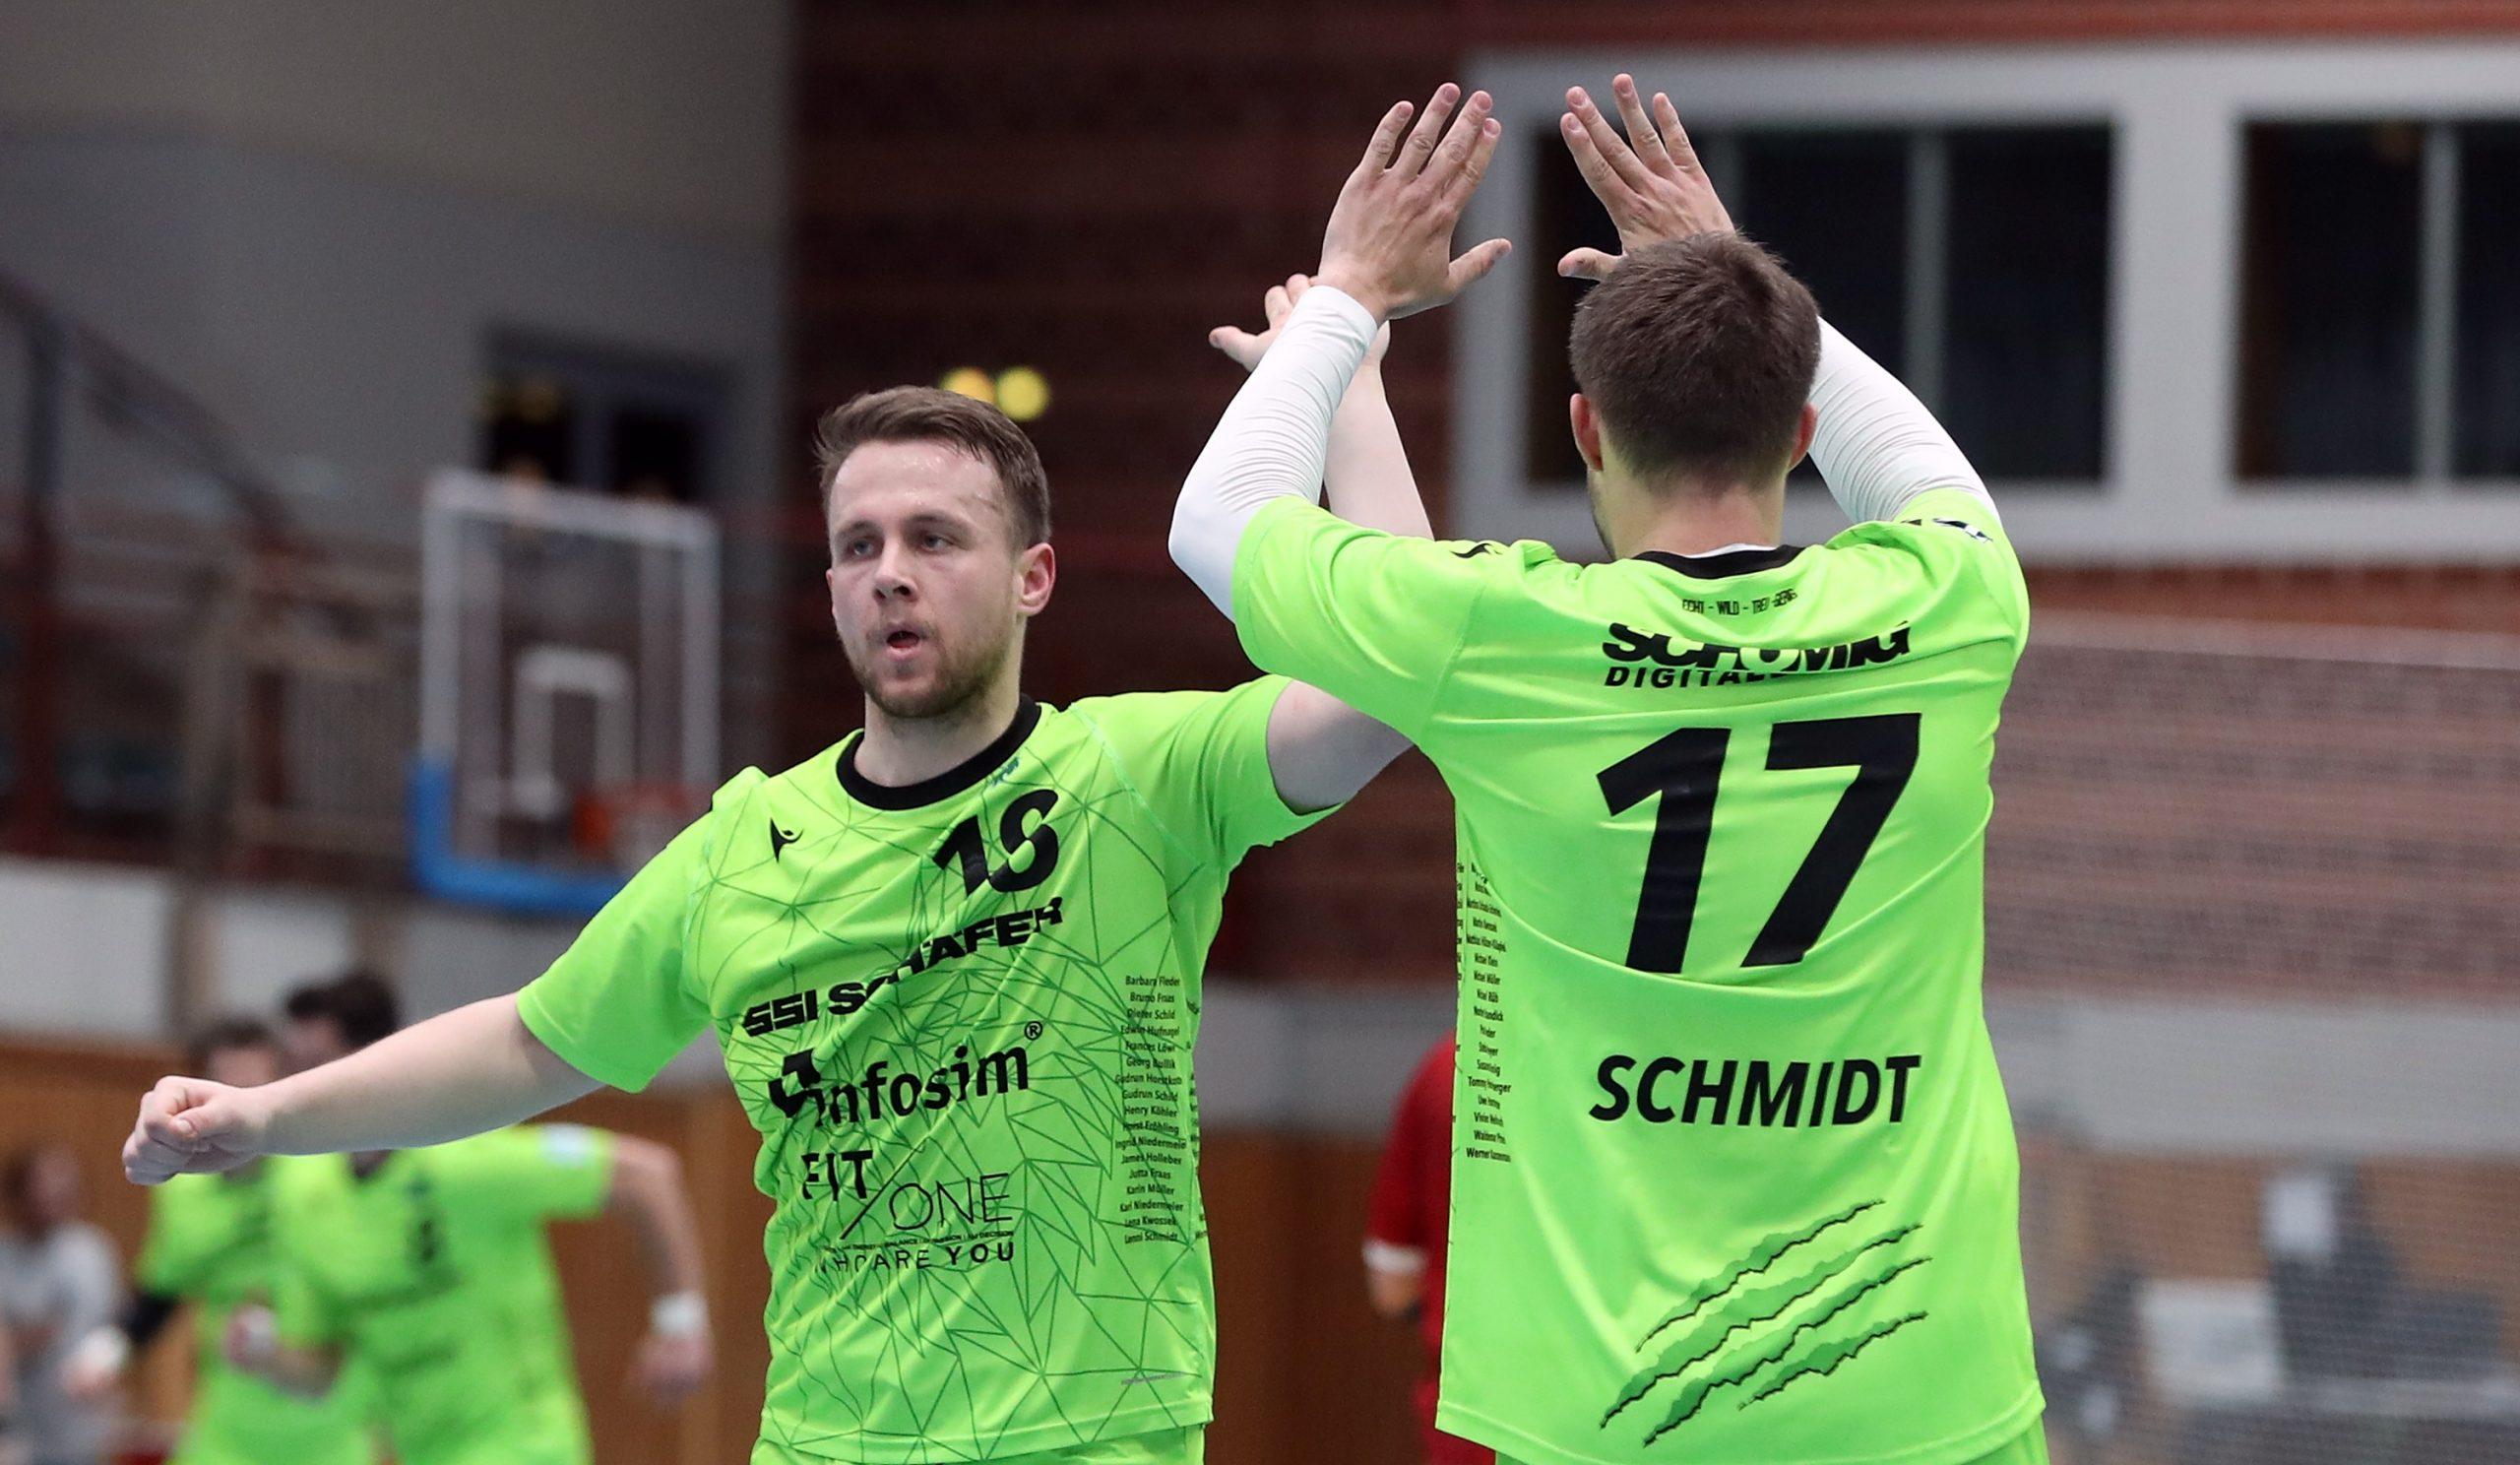 WÖLFE – VfL Lübeck-Schwartau (03. April 2021) – Fotos